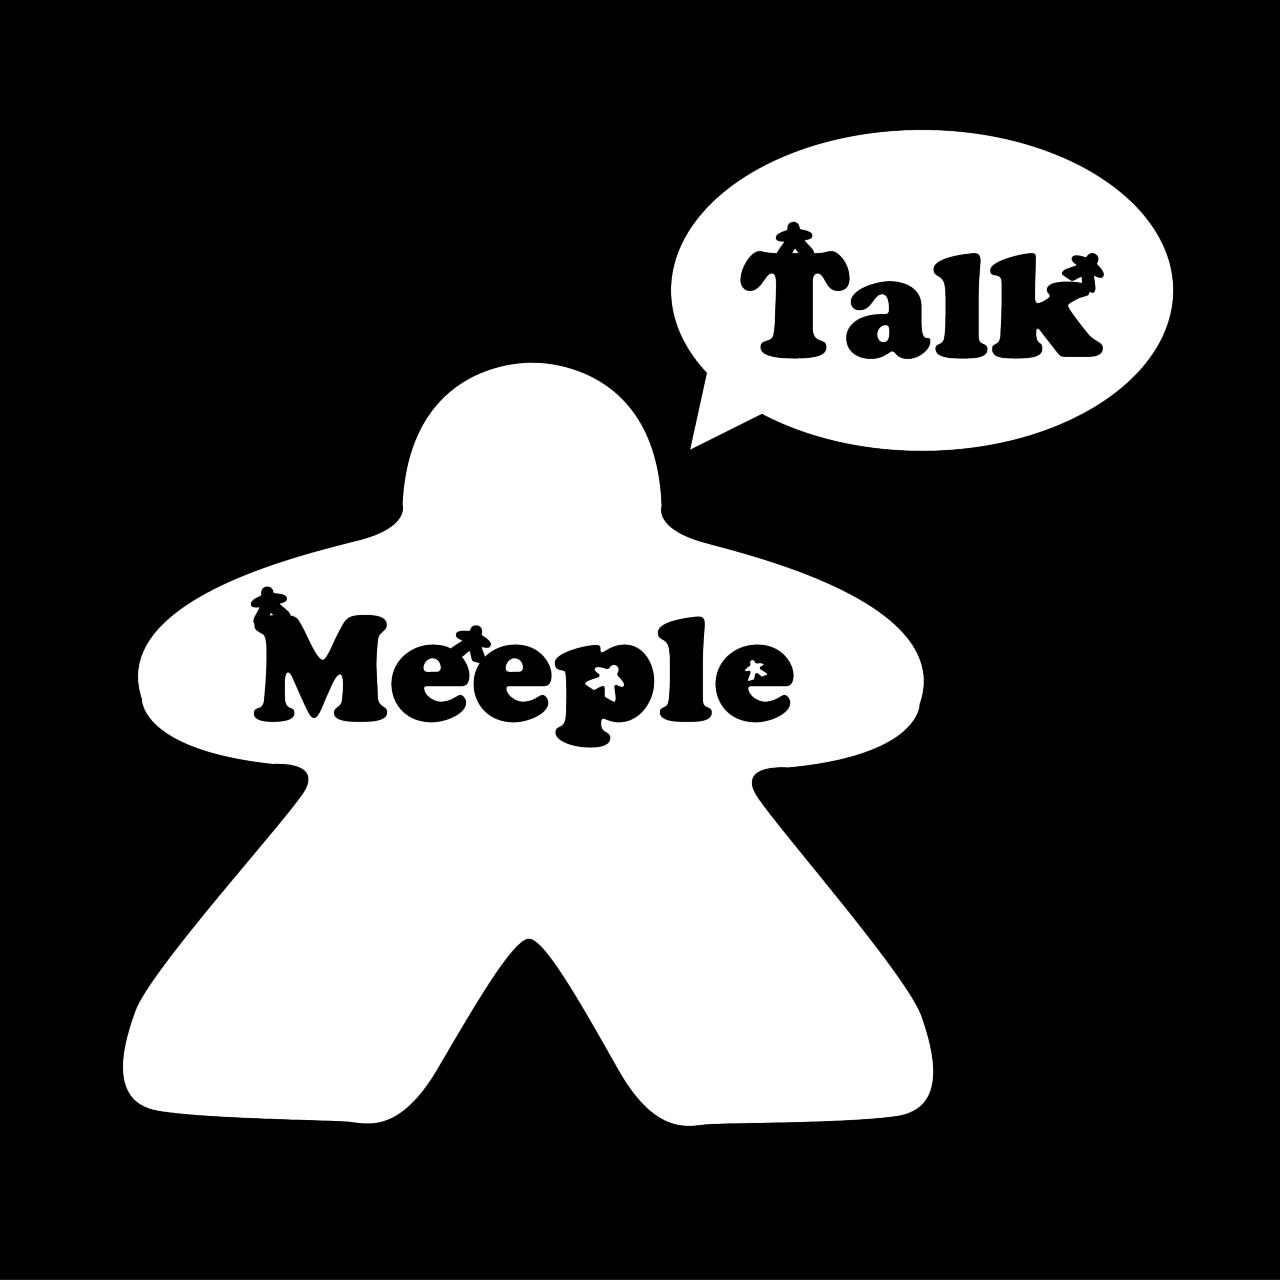 MeepleTalk第3集二氧化碳CO2